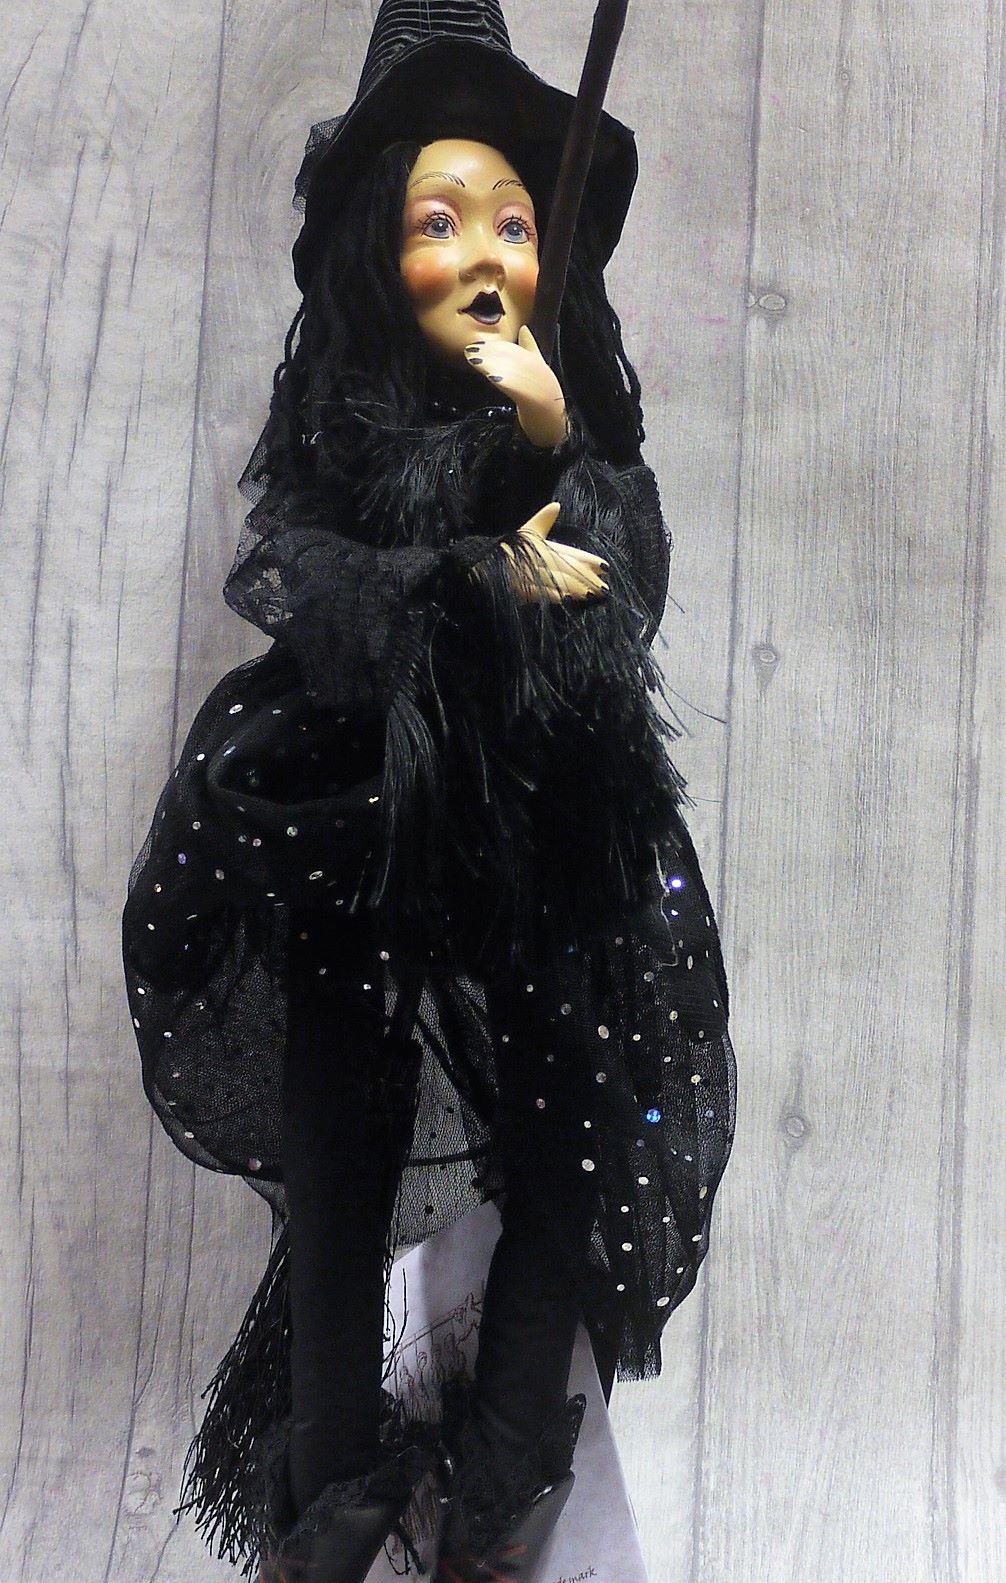 Zilla goth black 50cm